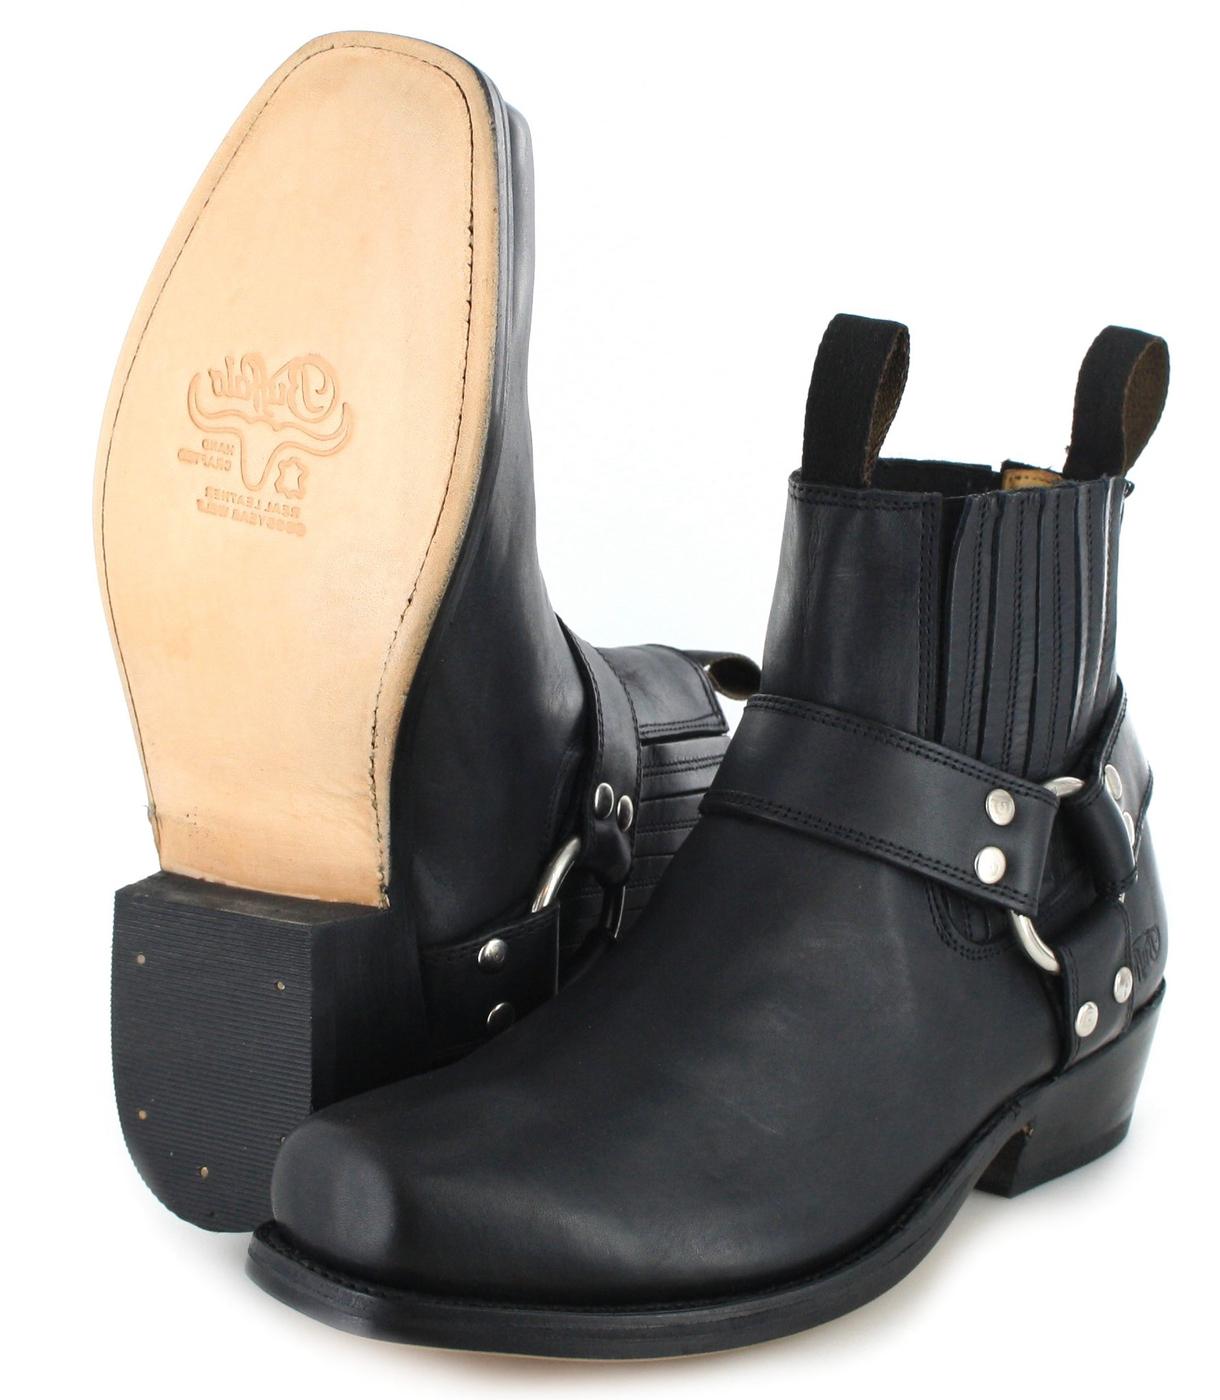 Buffalo Boots 6000 biker ankle boot black